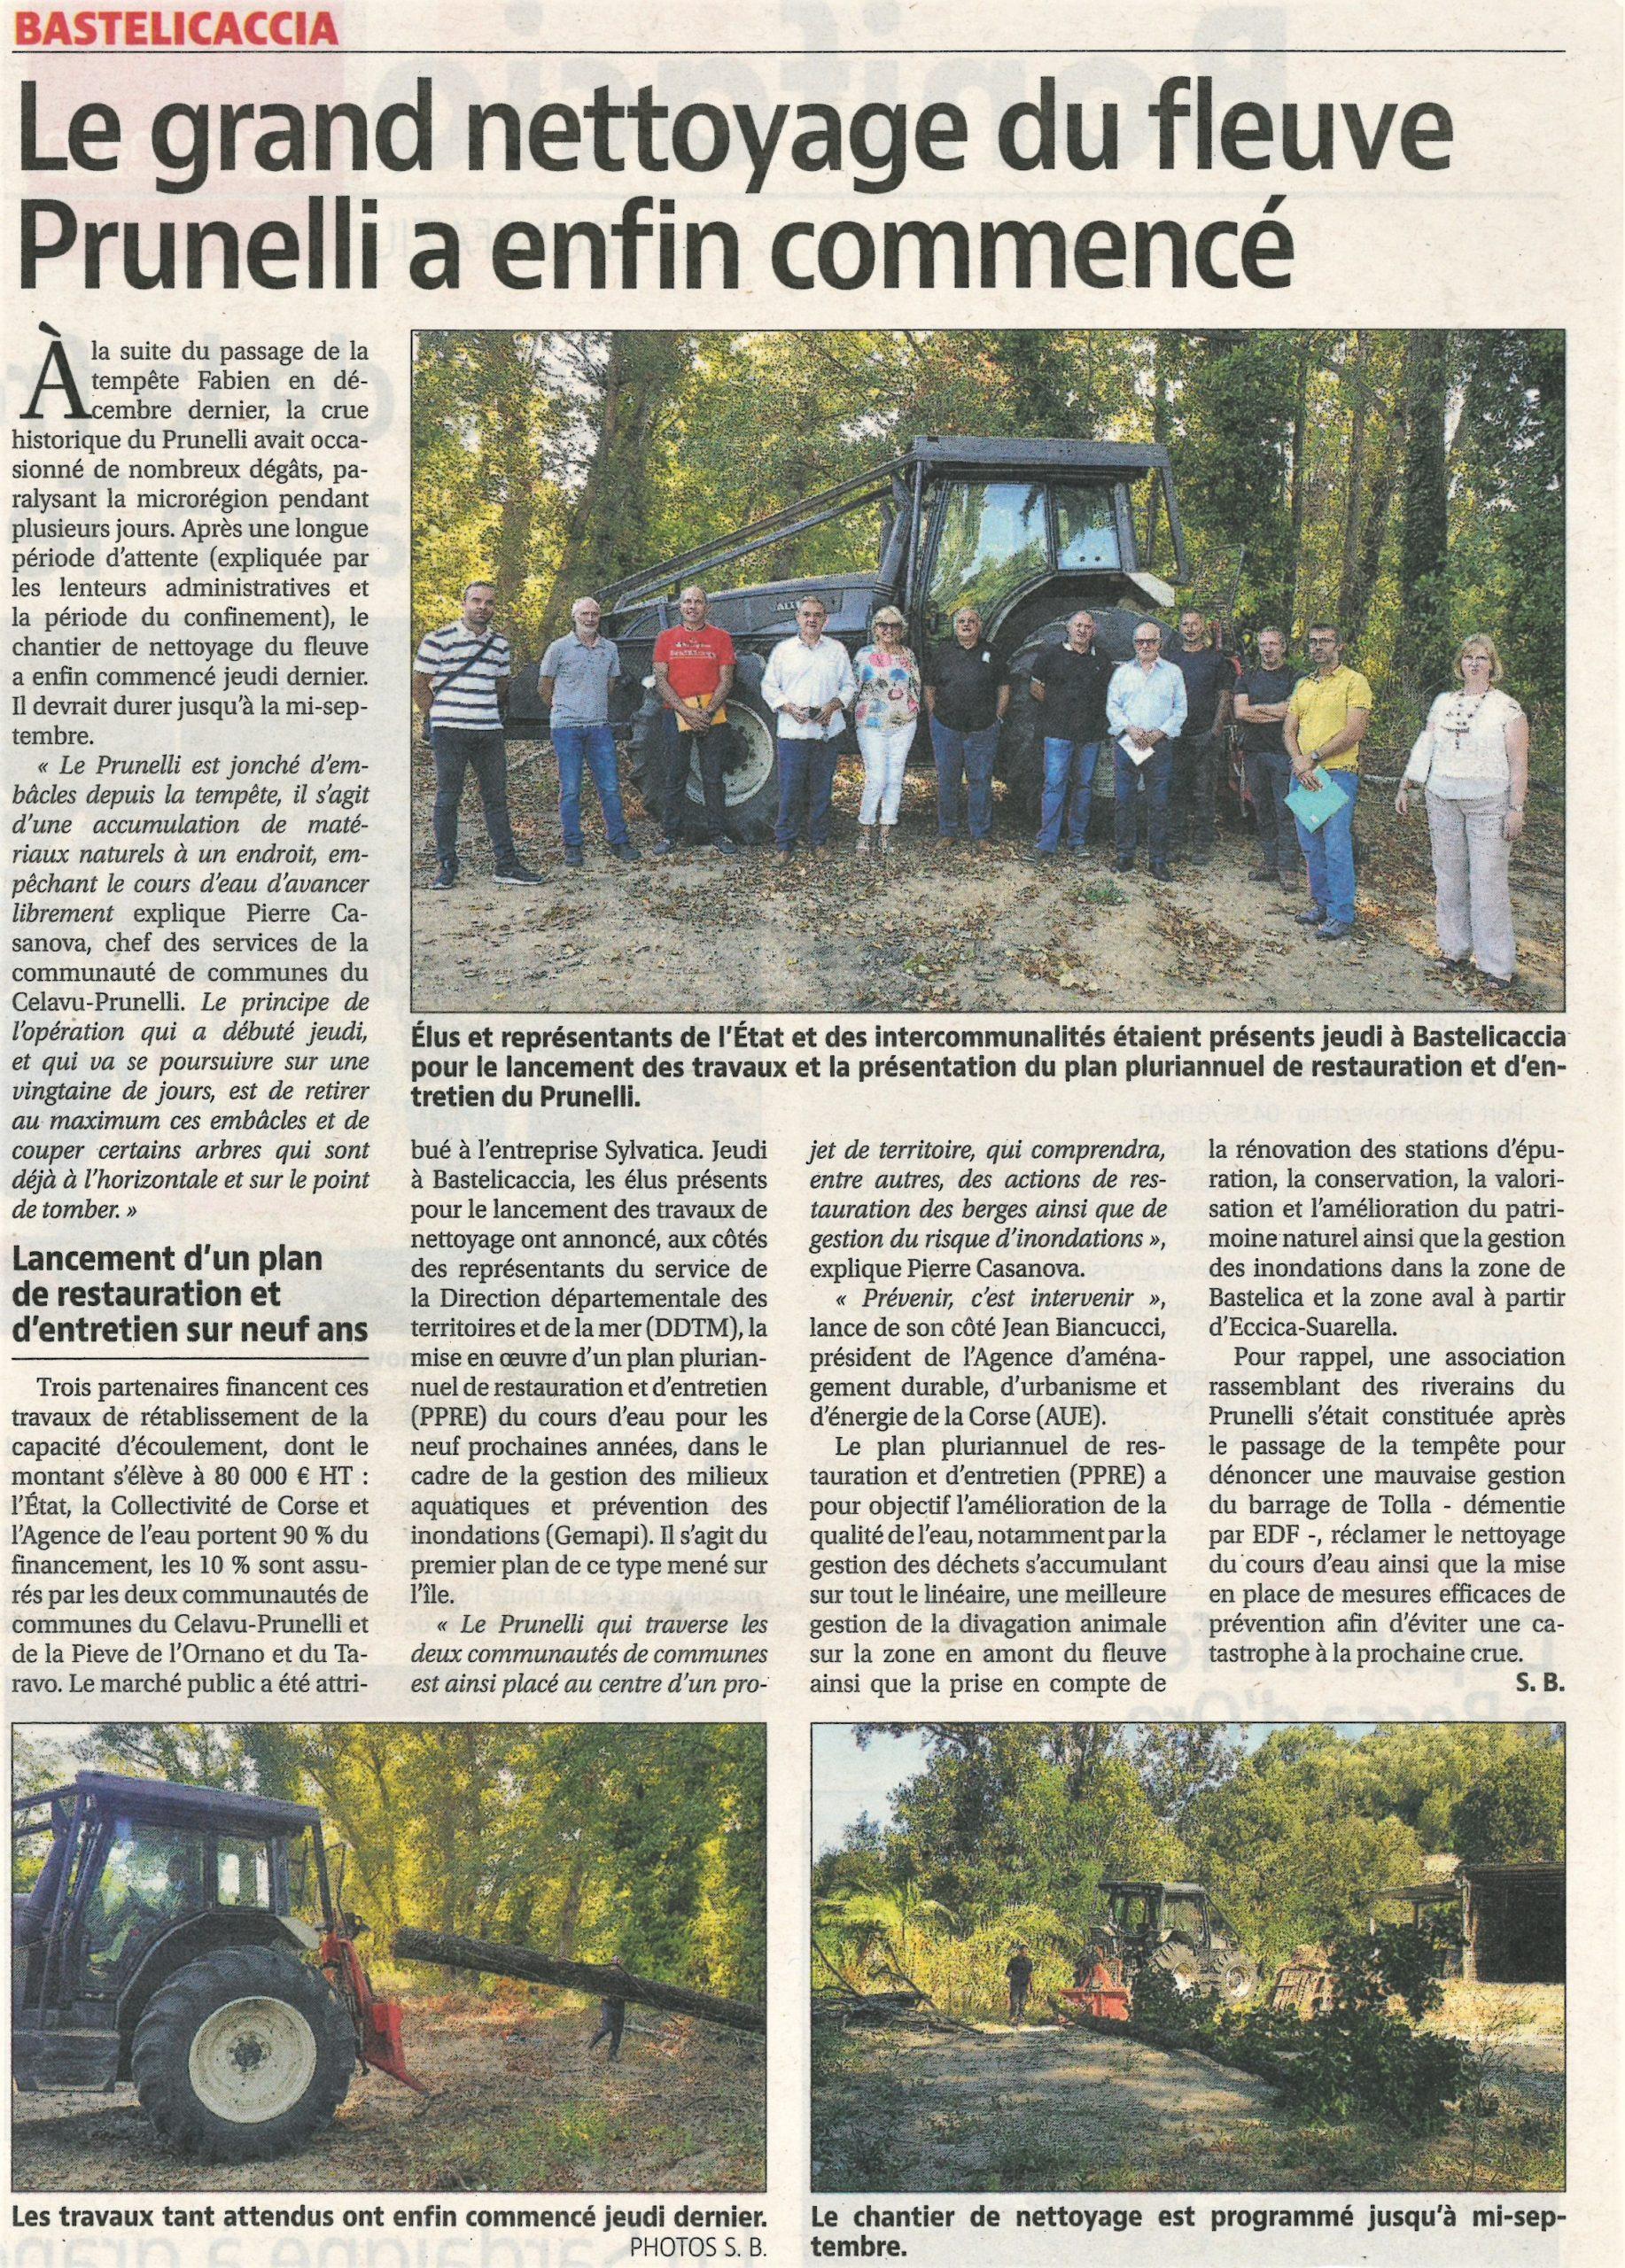 Nettoyage du fleuve Prunelli